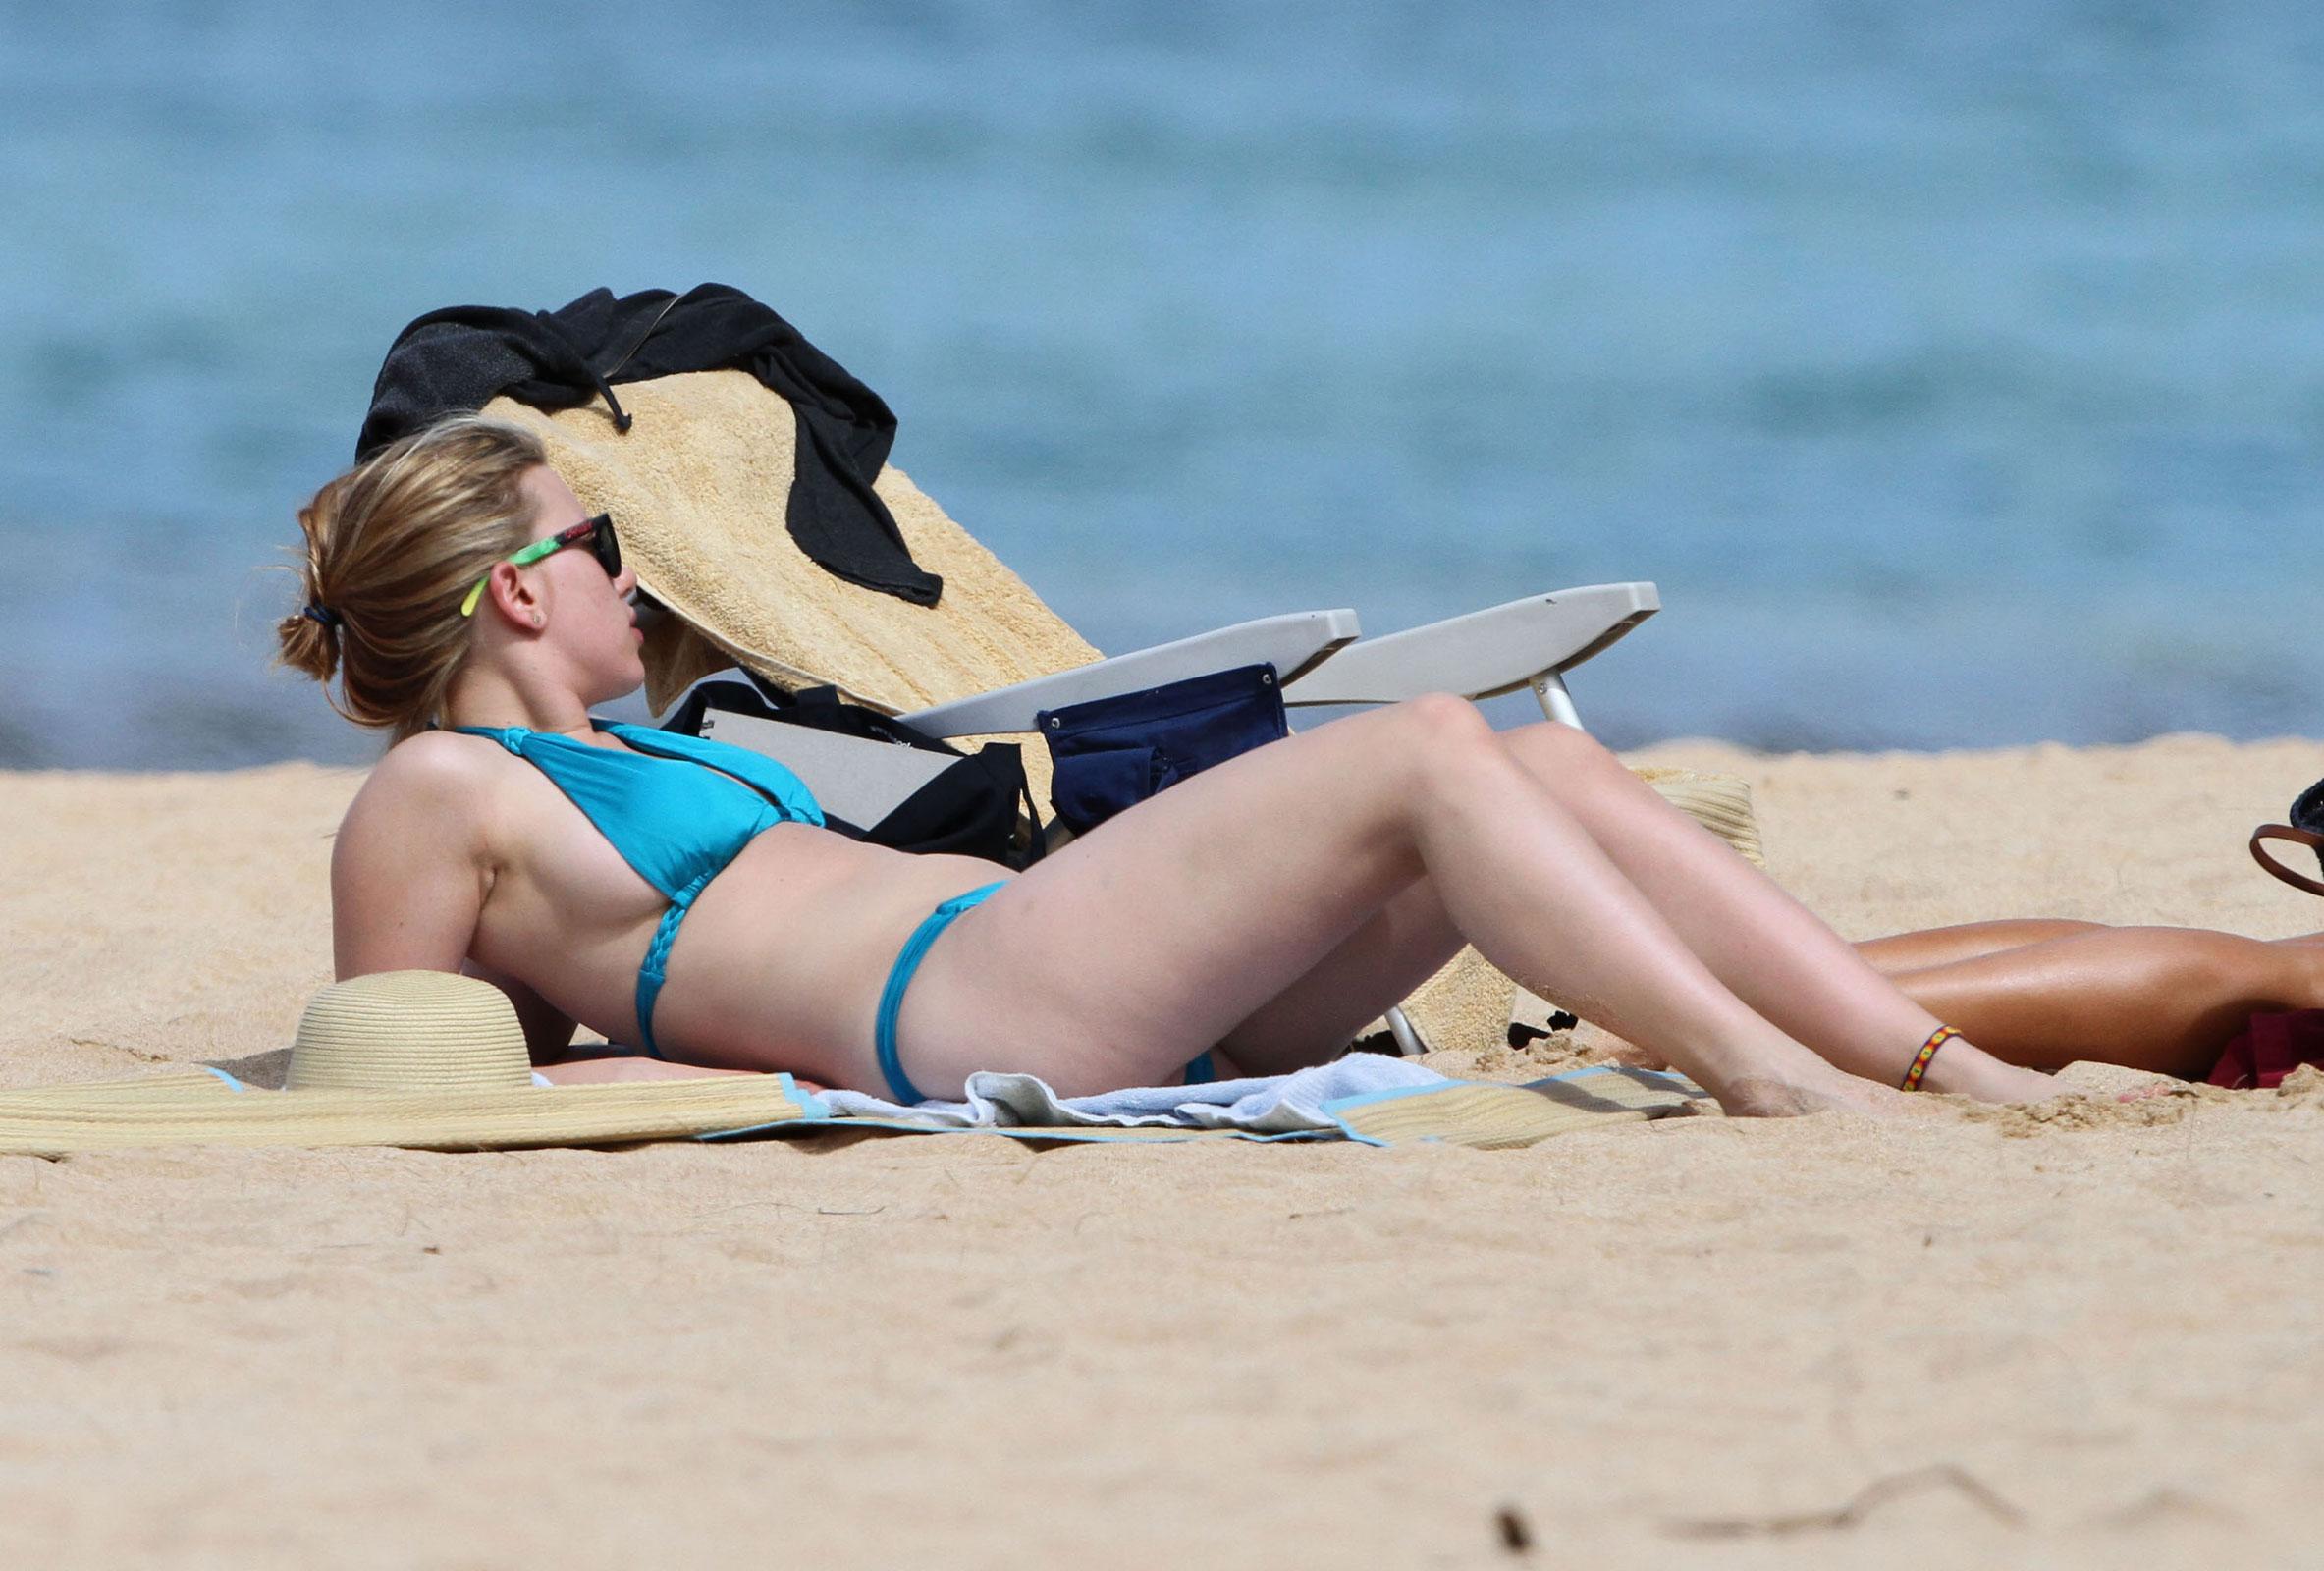 Scarlett johansson bikini photos